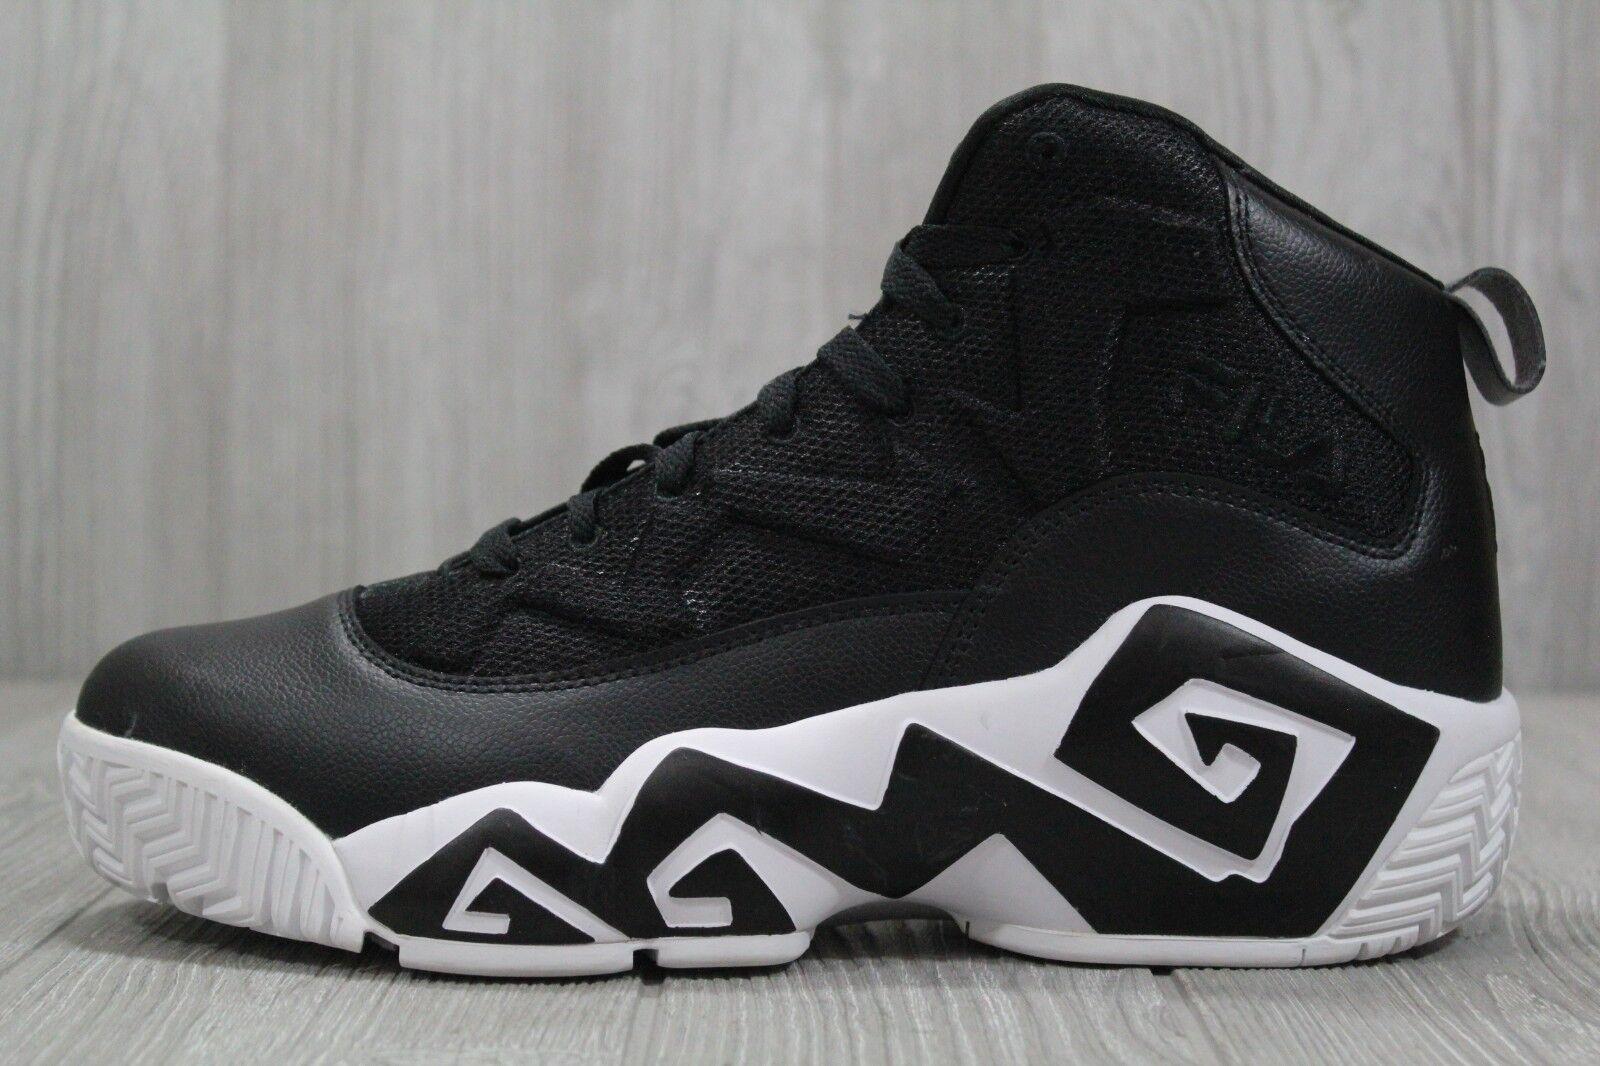 35 Fila MB Basketball shoes Limited Edition Leather Jamaal Mashburn Sz 12